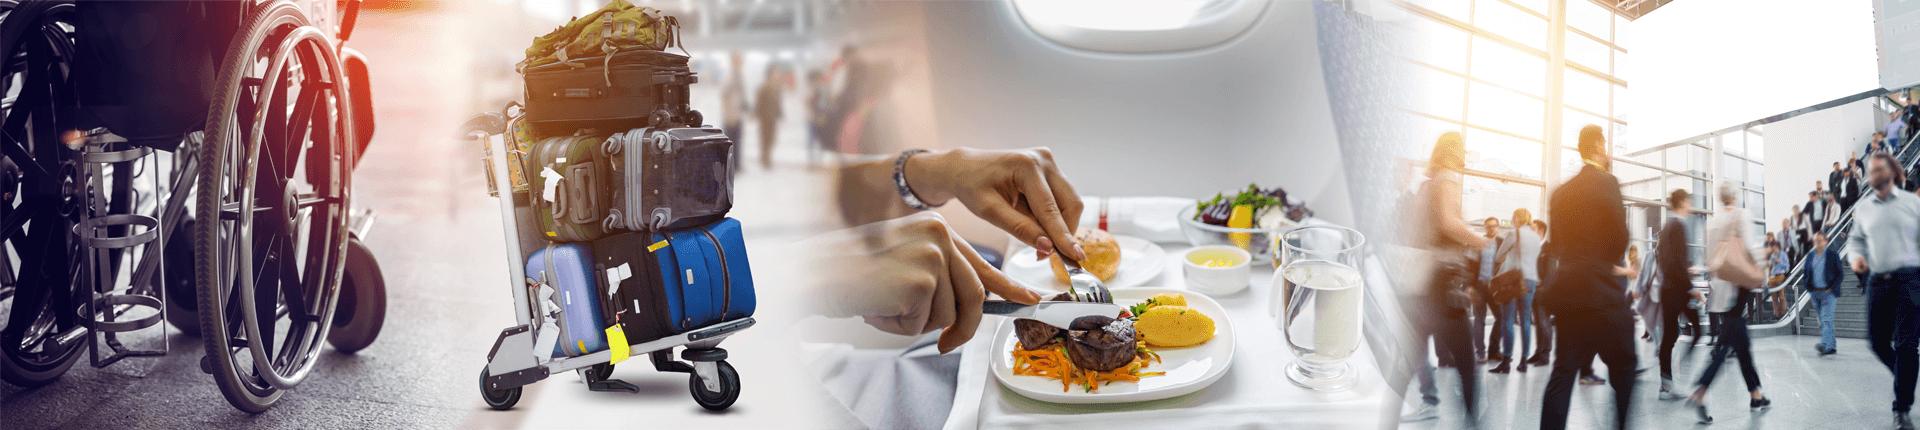 Baggage - Pakistan International Airlines - PIA